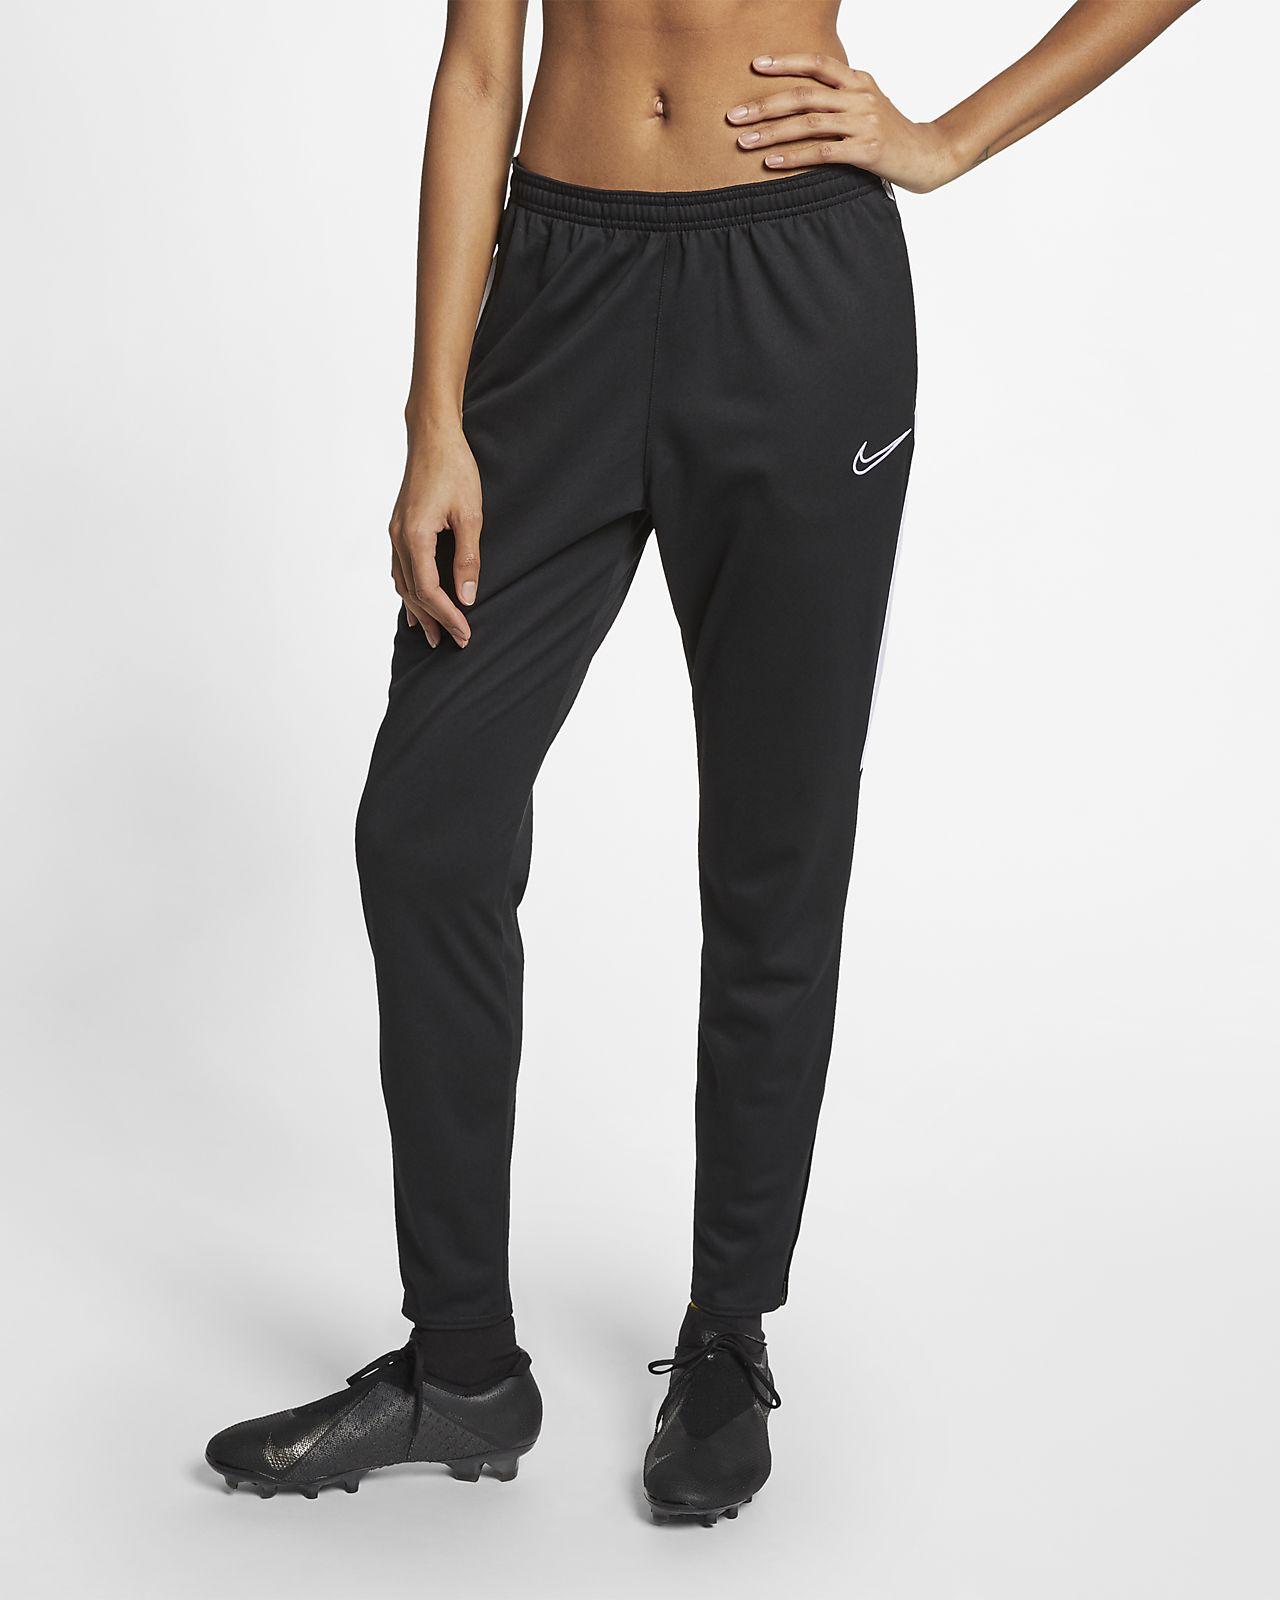 Nike Dri FIT Academy fodboldbukser til kvinder